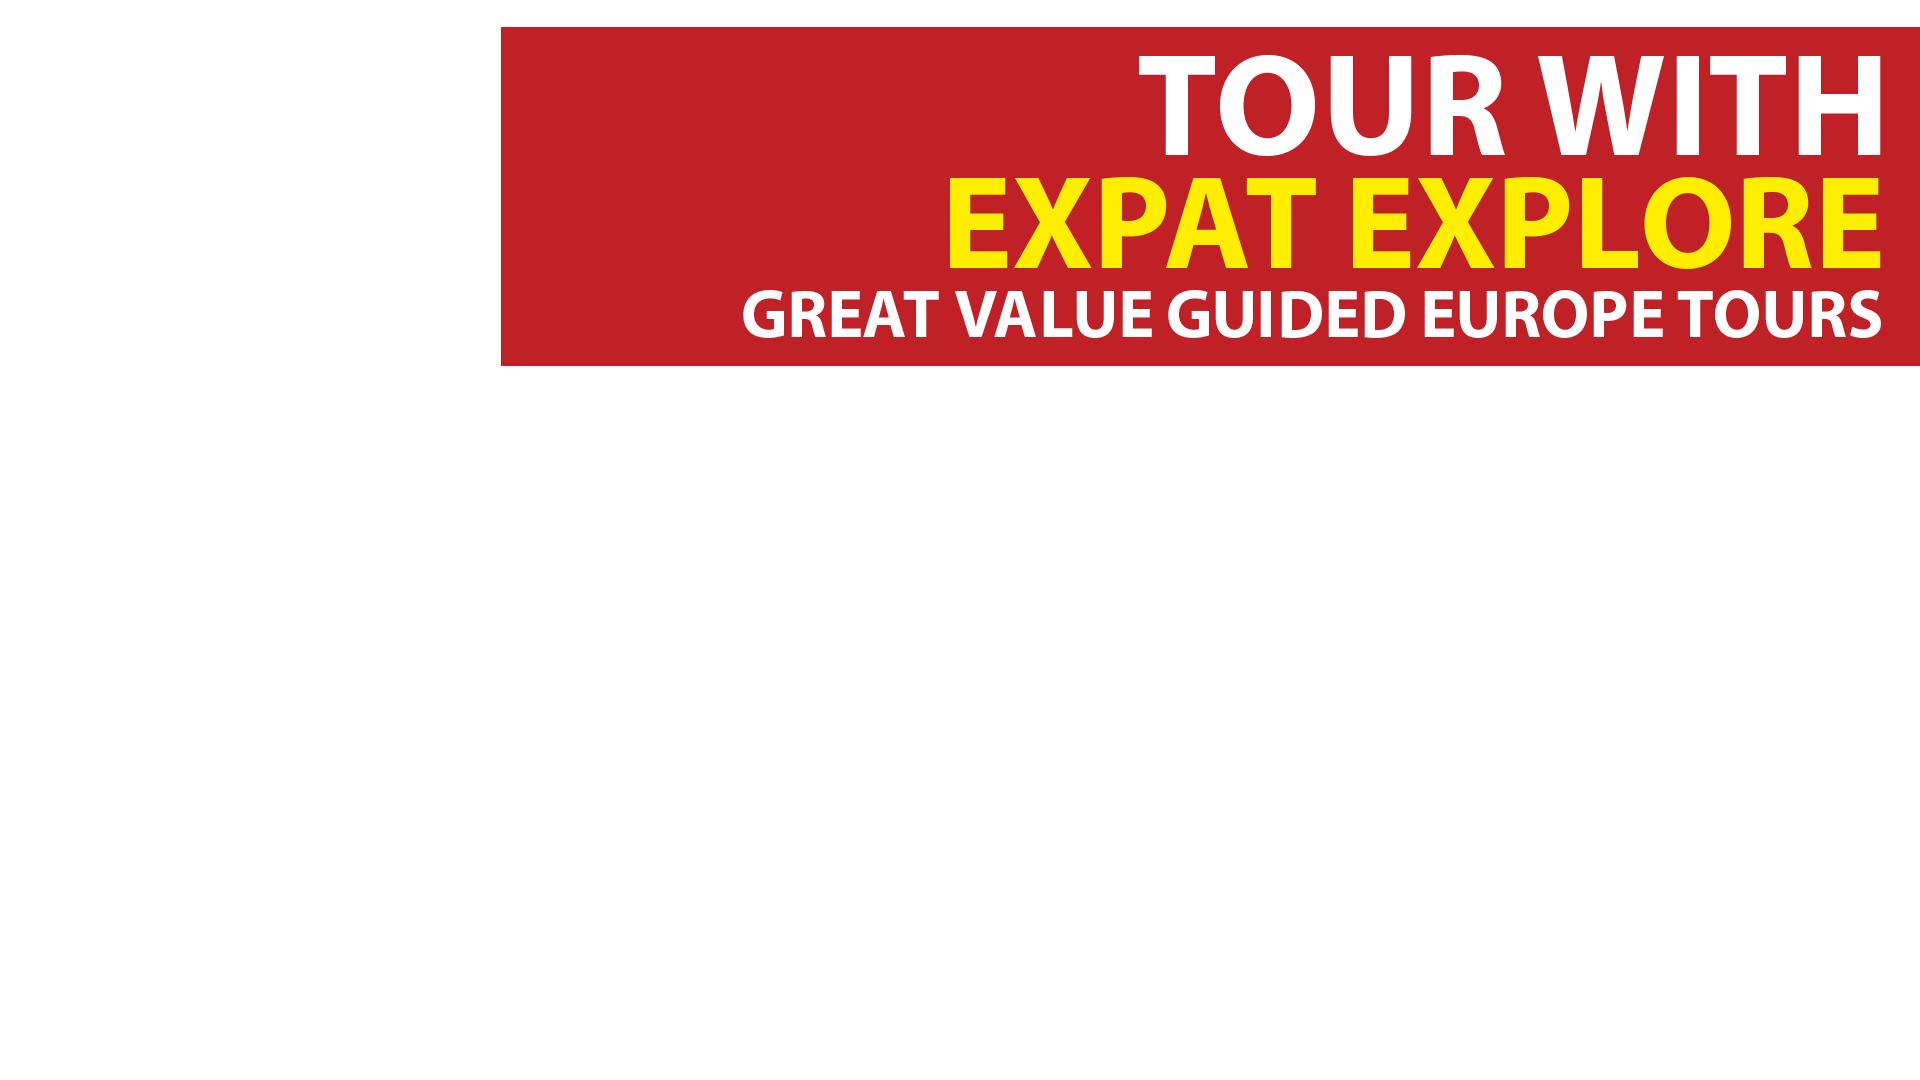 Expat Explore